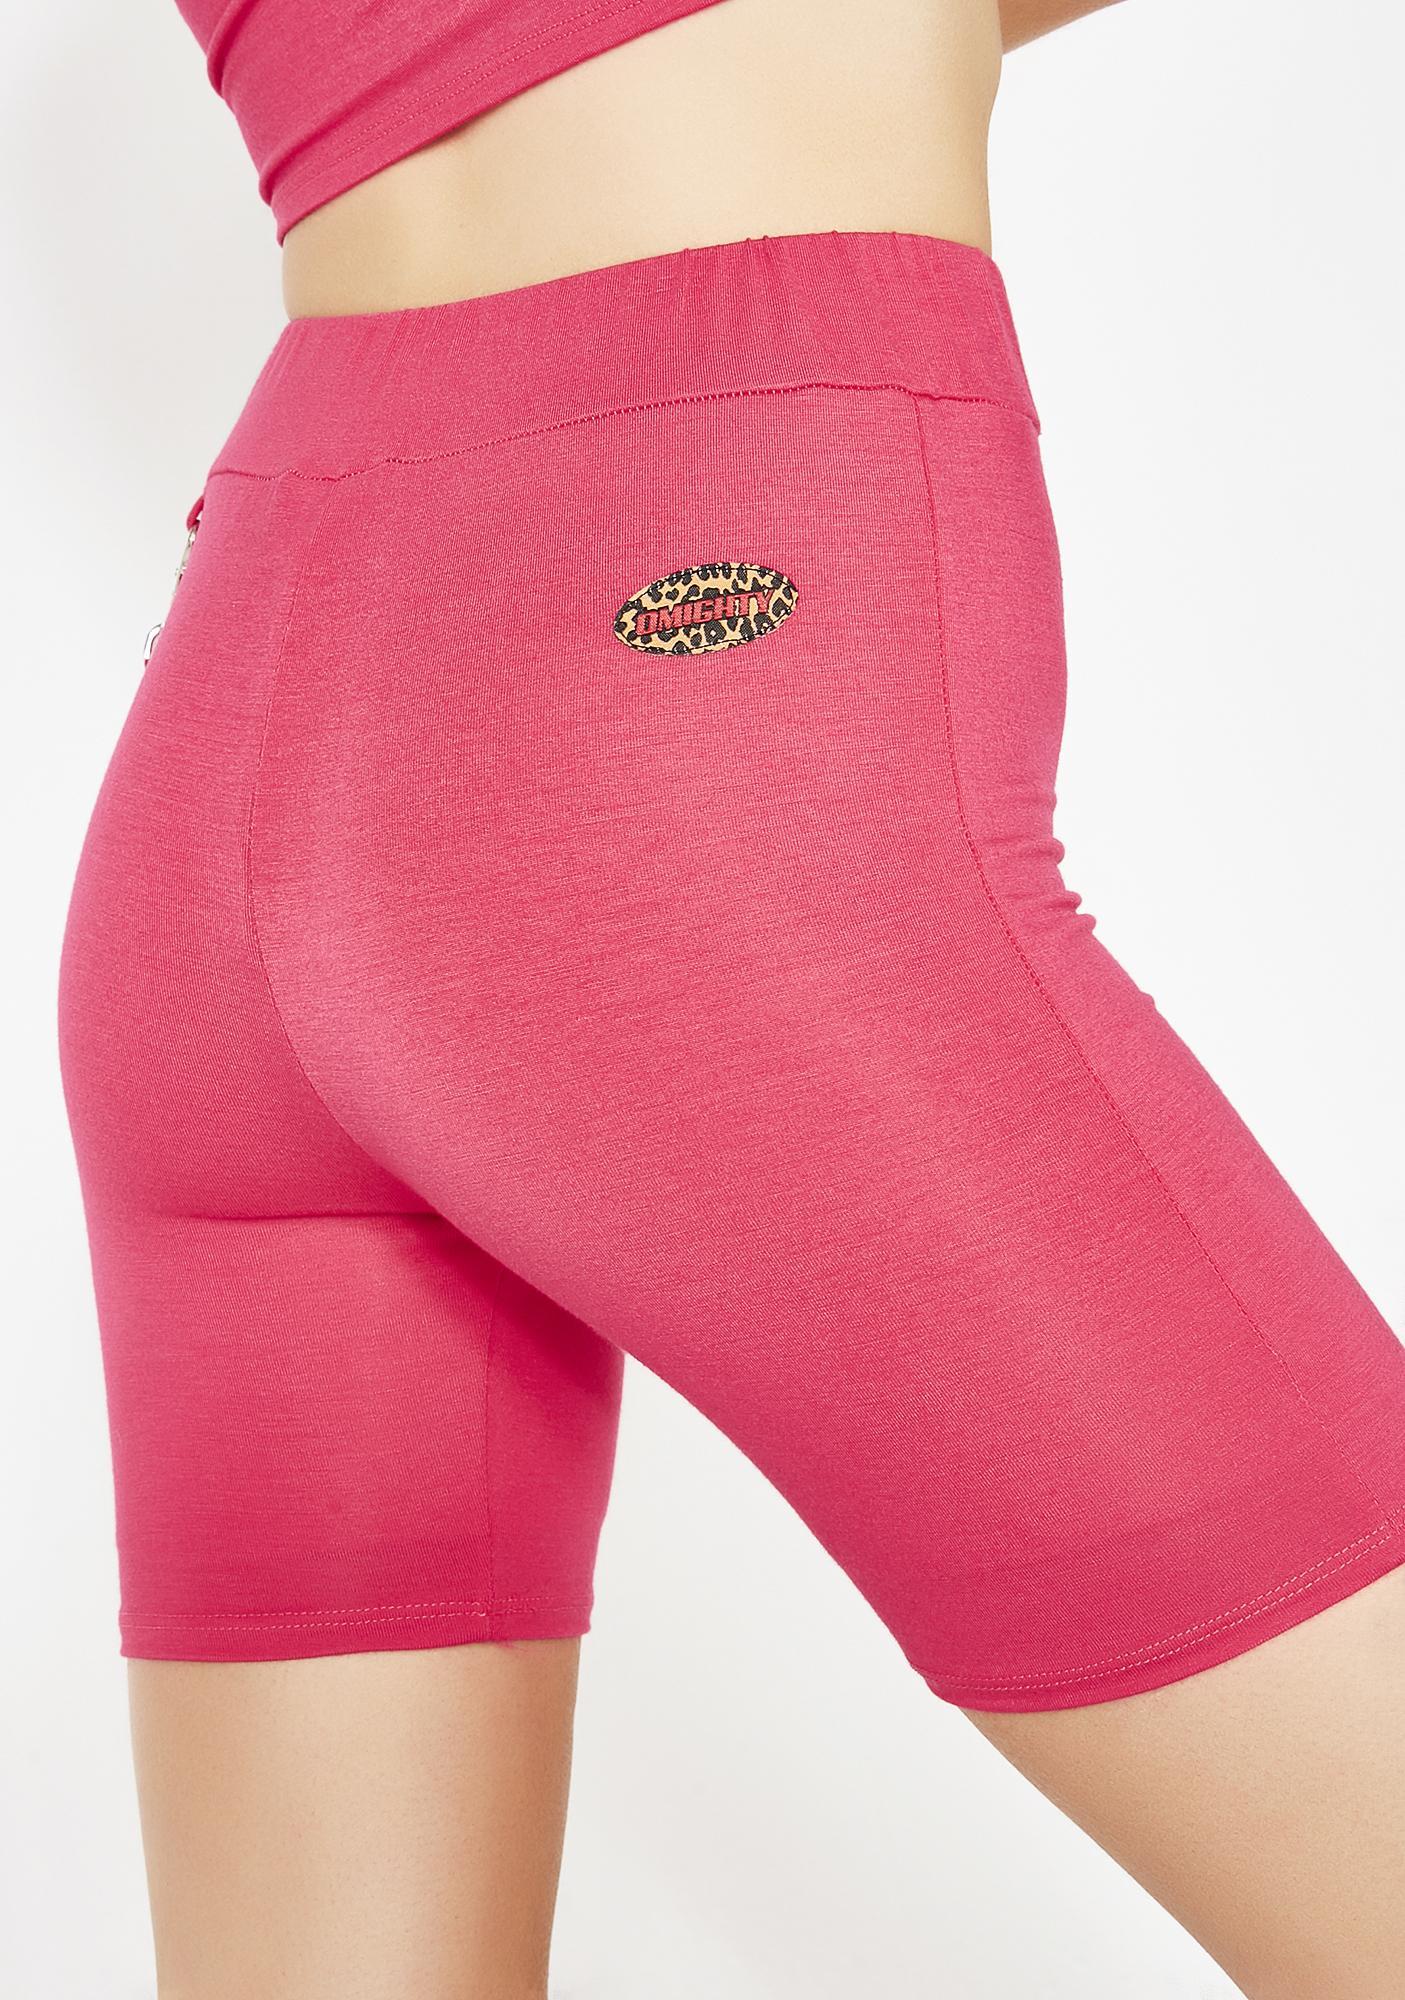 O Mighty Chain Bike Shorts